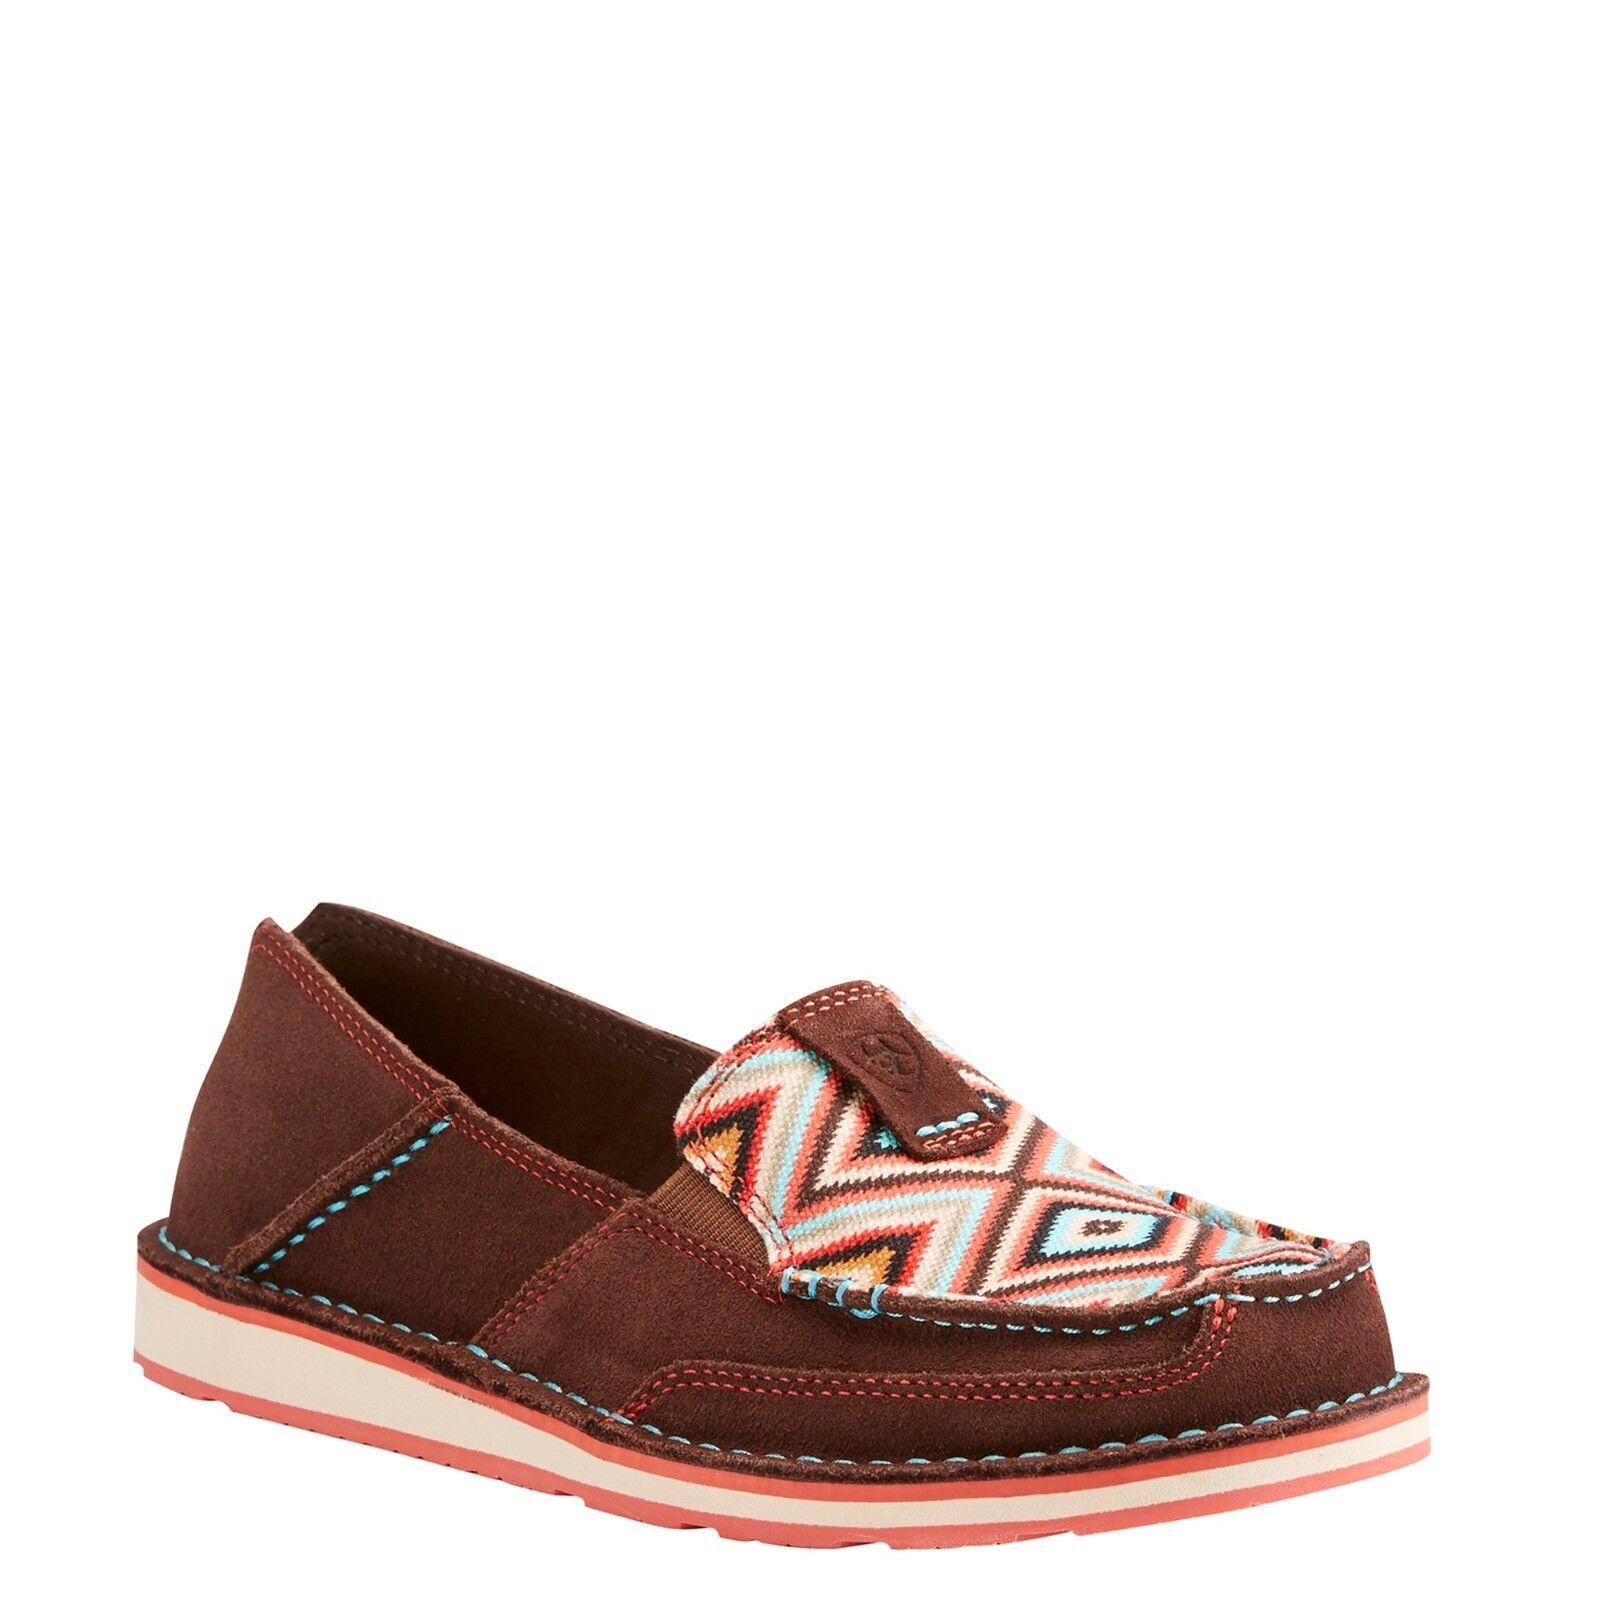 Ariat® Ladies Cruiser Coffee Bean & Pastel Aztec shoes 10023011